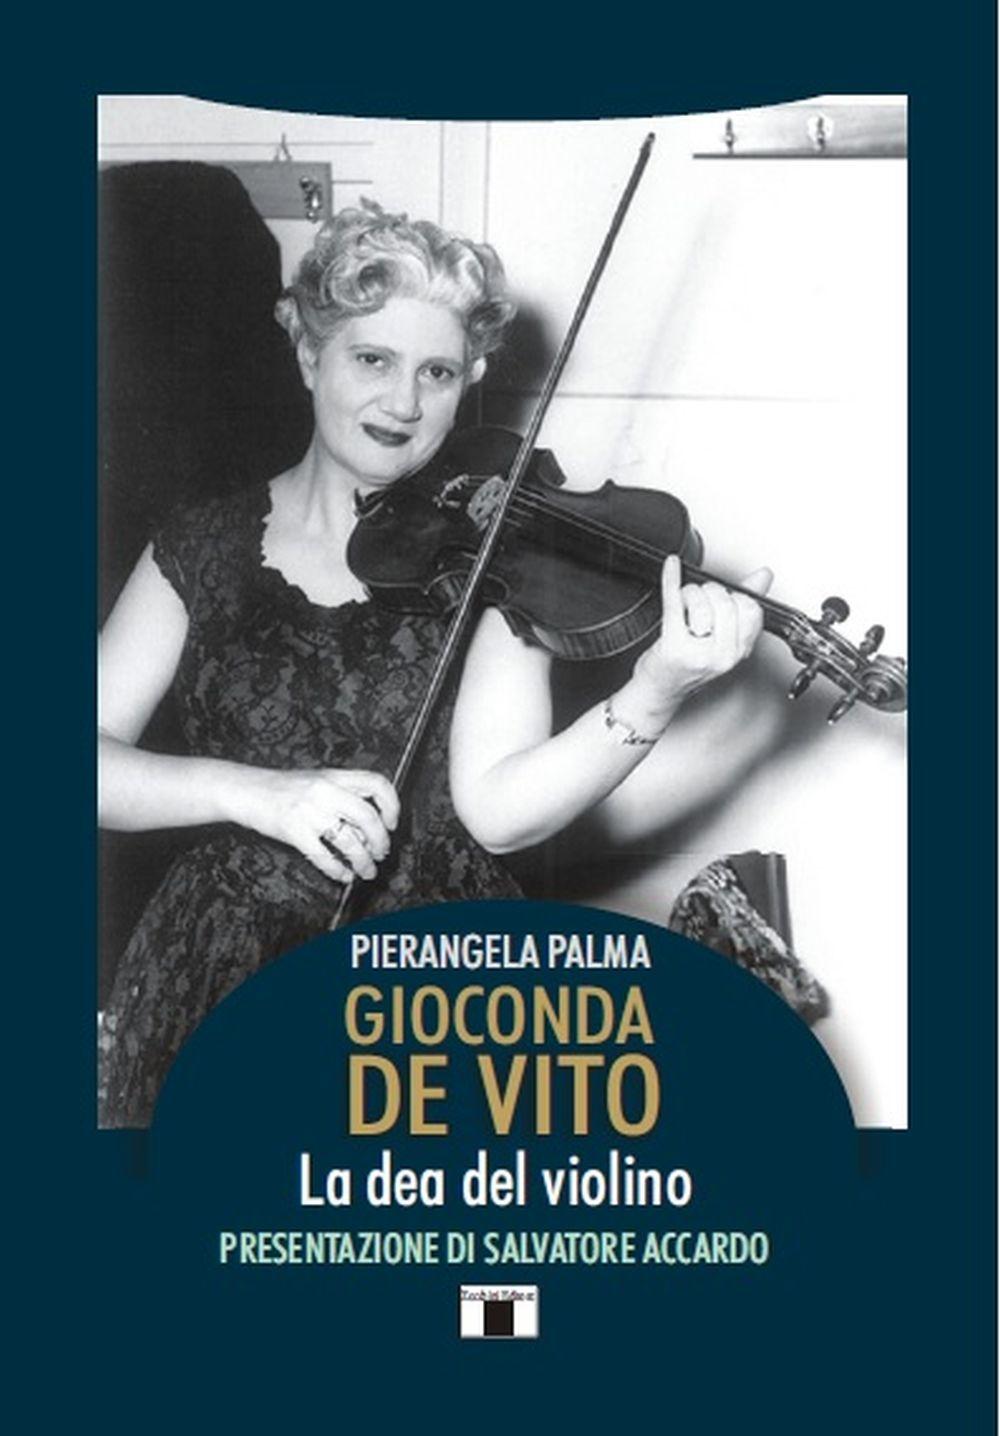 Pierangela Palma: Gioconda De Vito: Biography